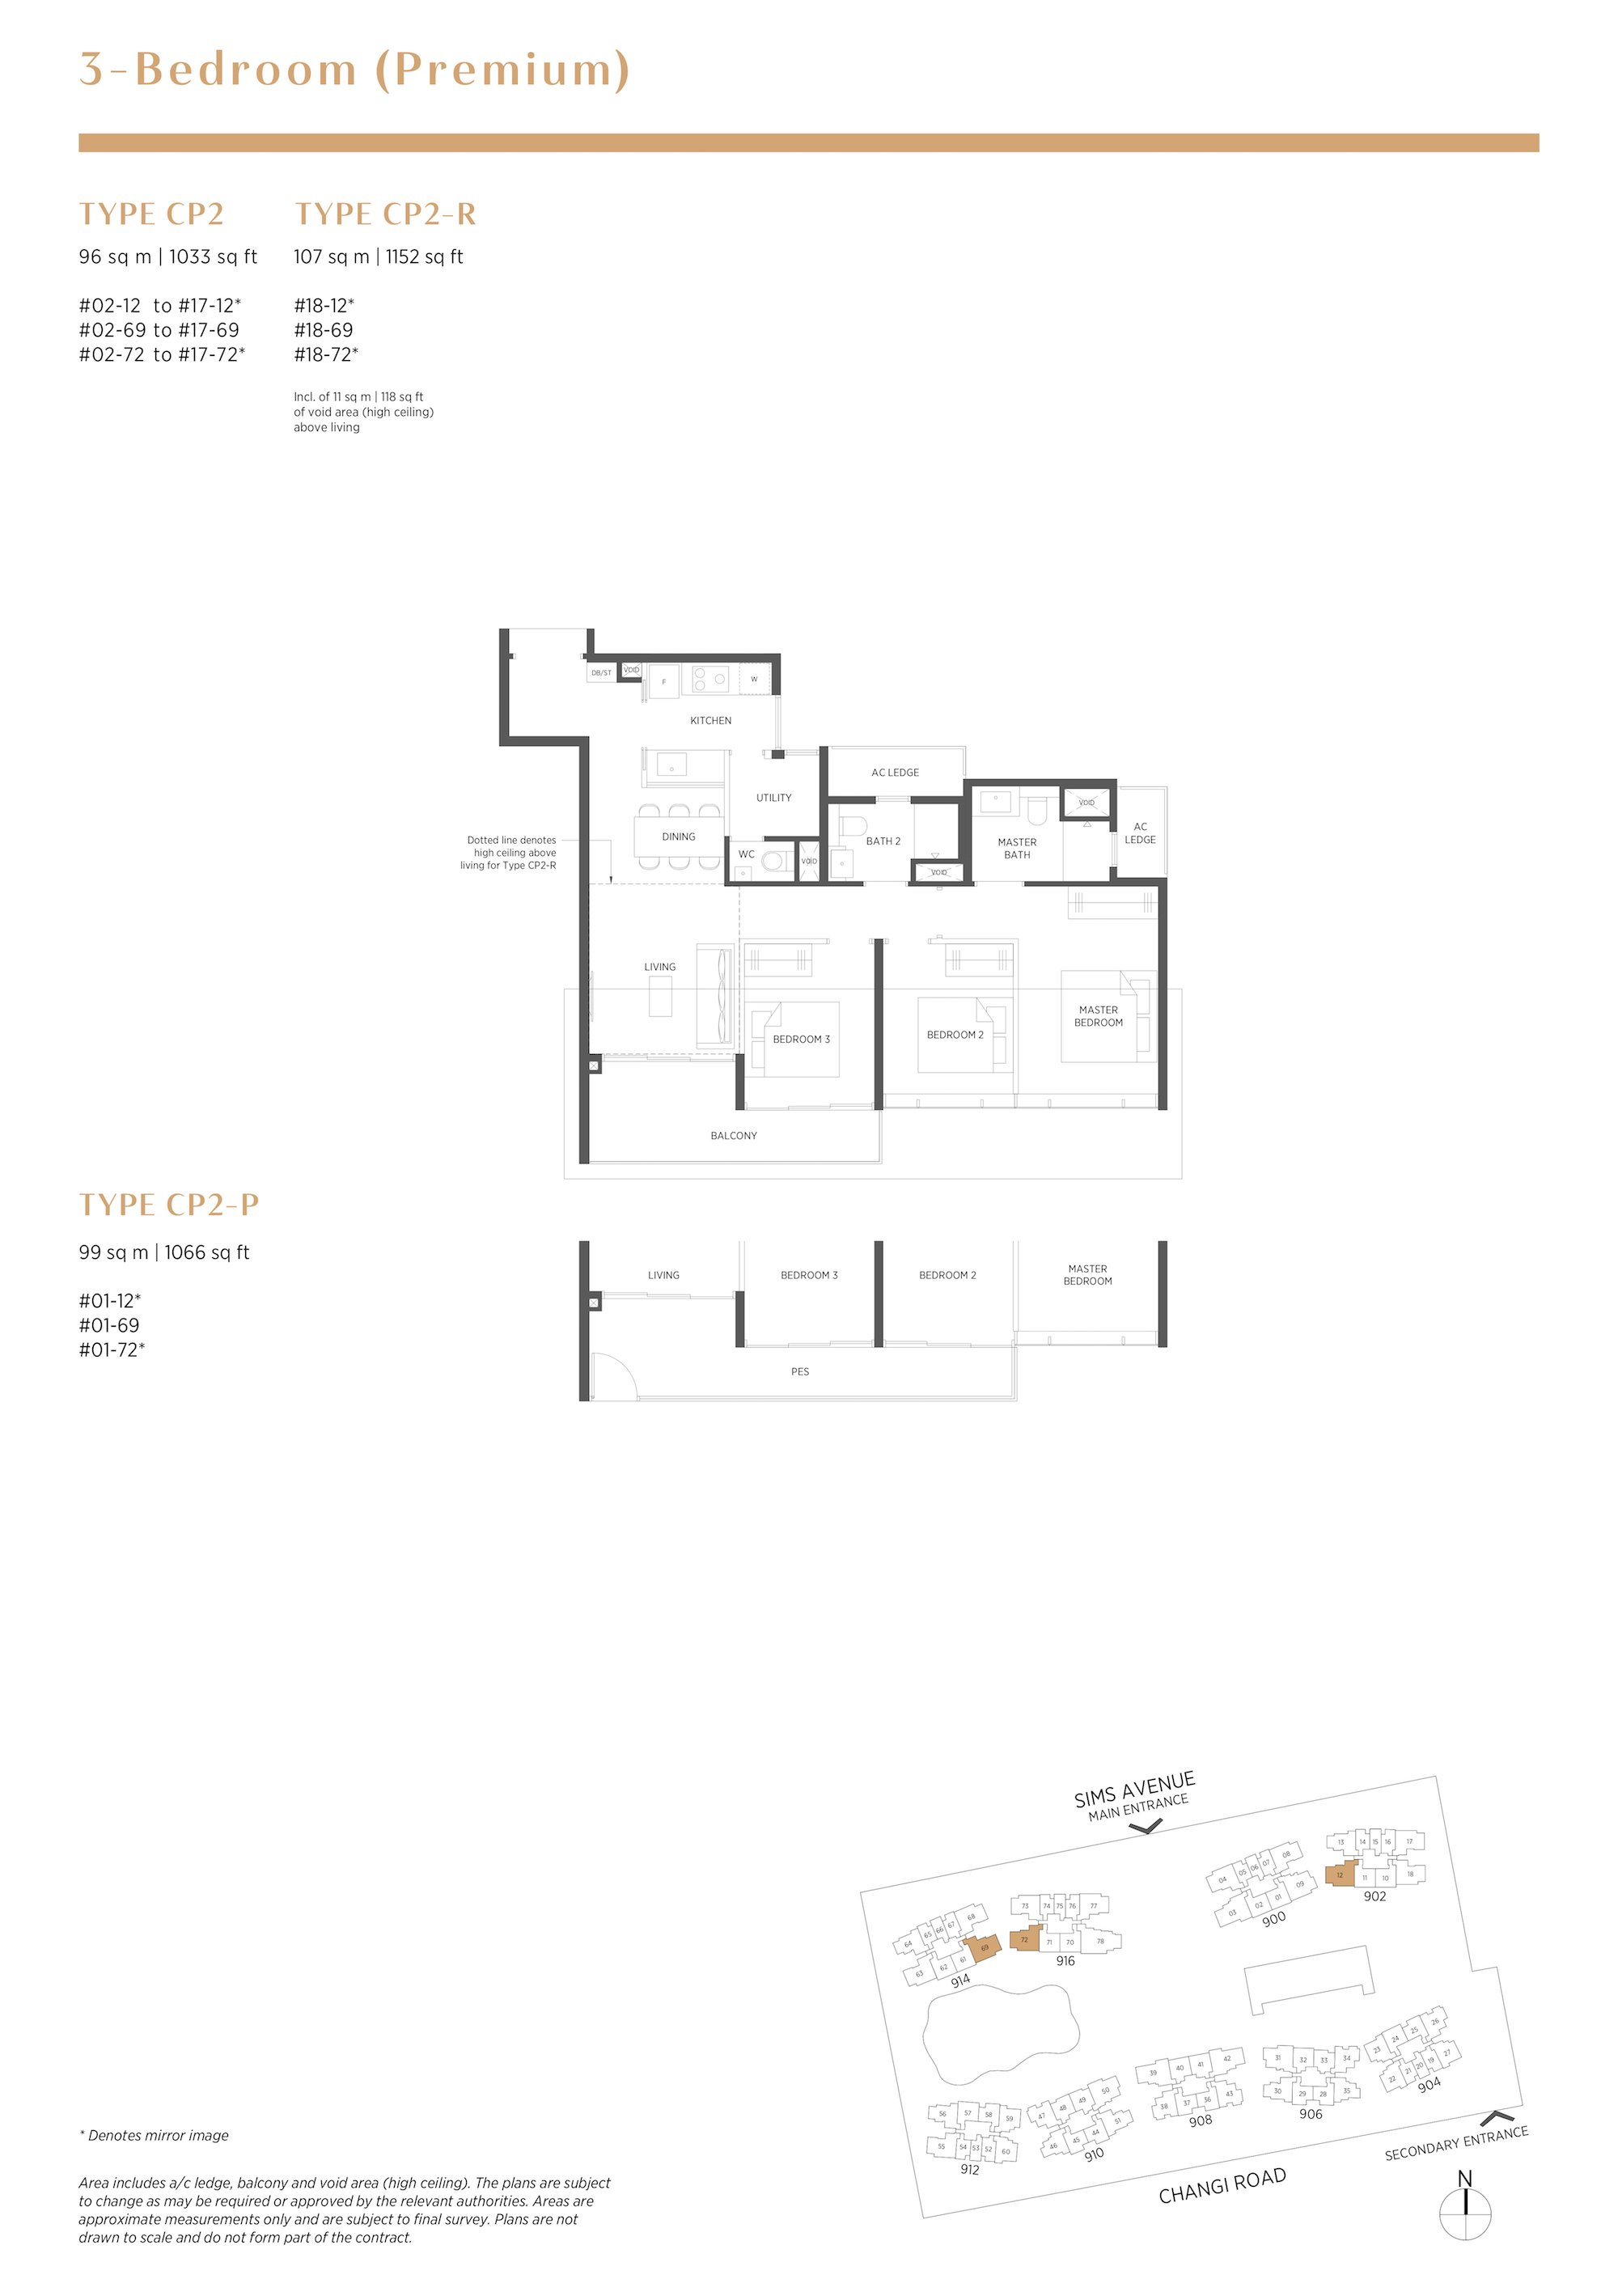 Parc Esta 东景苑 3 bedroom premium-3卧房优质 CP2